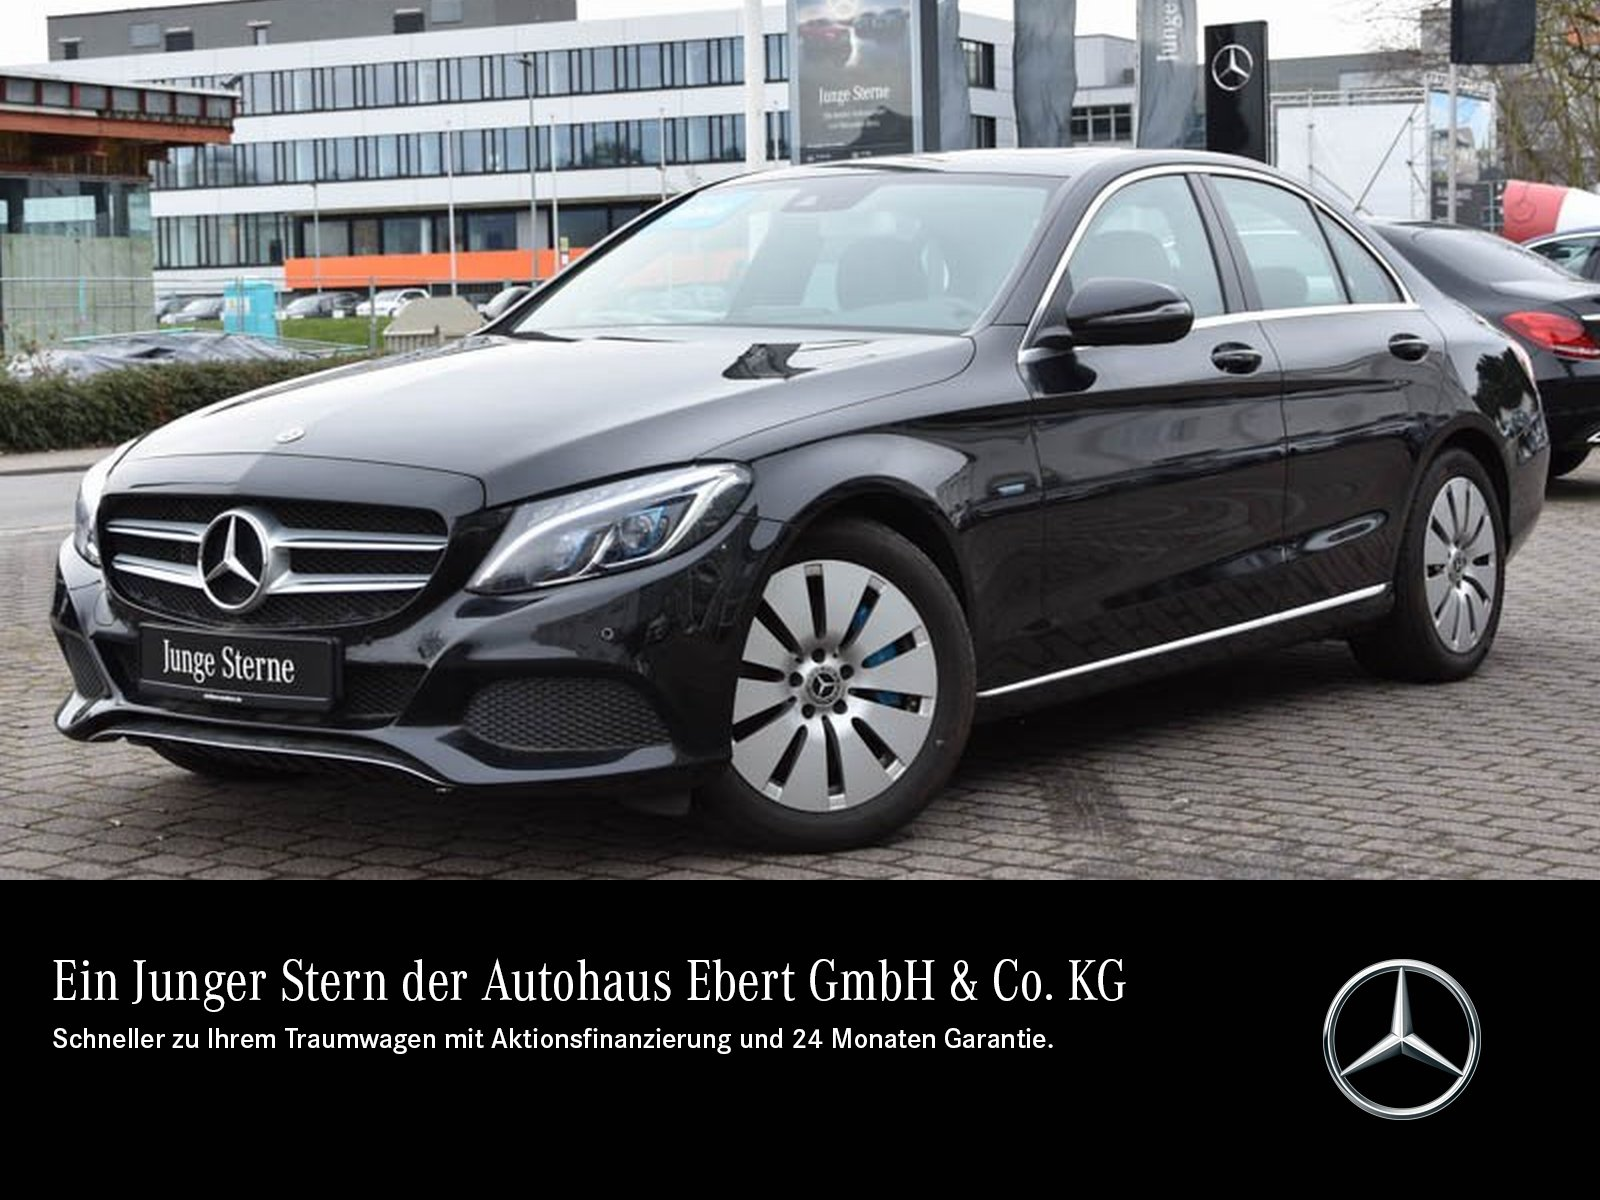 Mercedes-Benz C 350 e Avantgarde 7G+COMAND+LED+ESHD+AIRMATIC, Jahr 2017, Hybrid